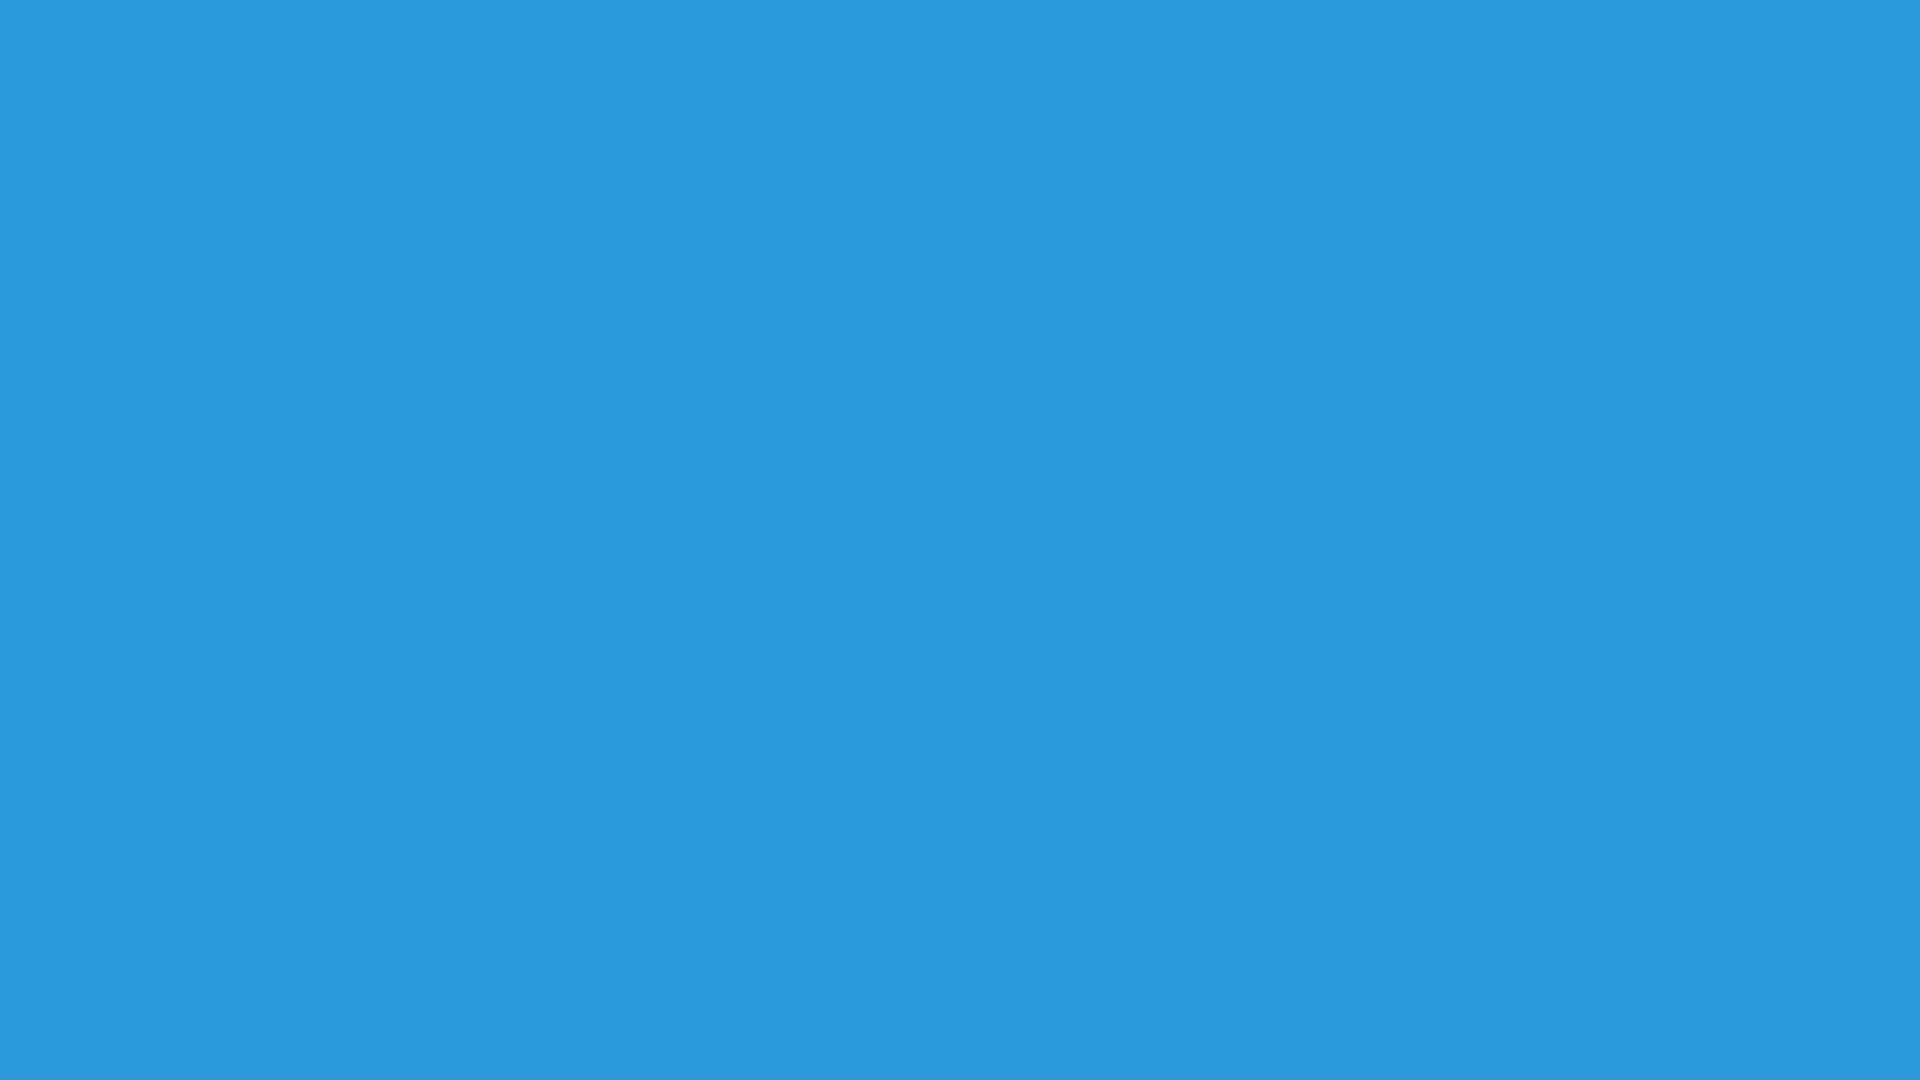 blue - Neogek Web and Graphic Design